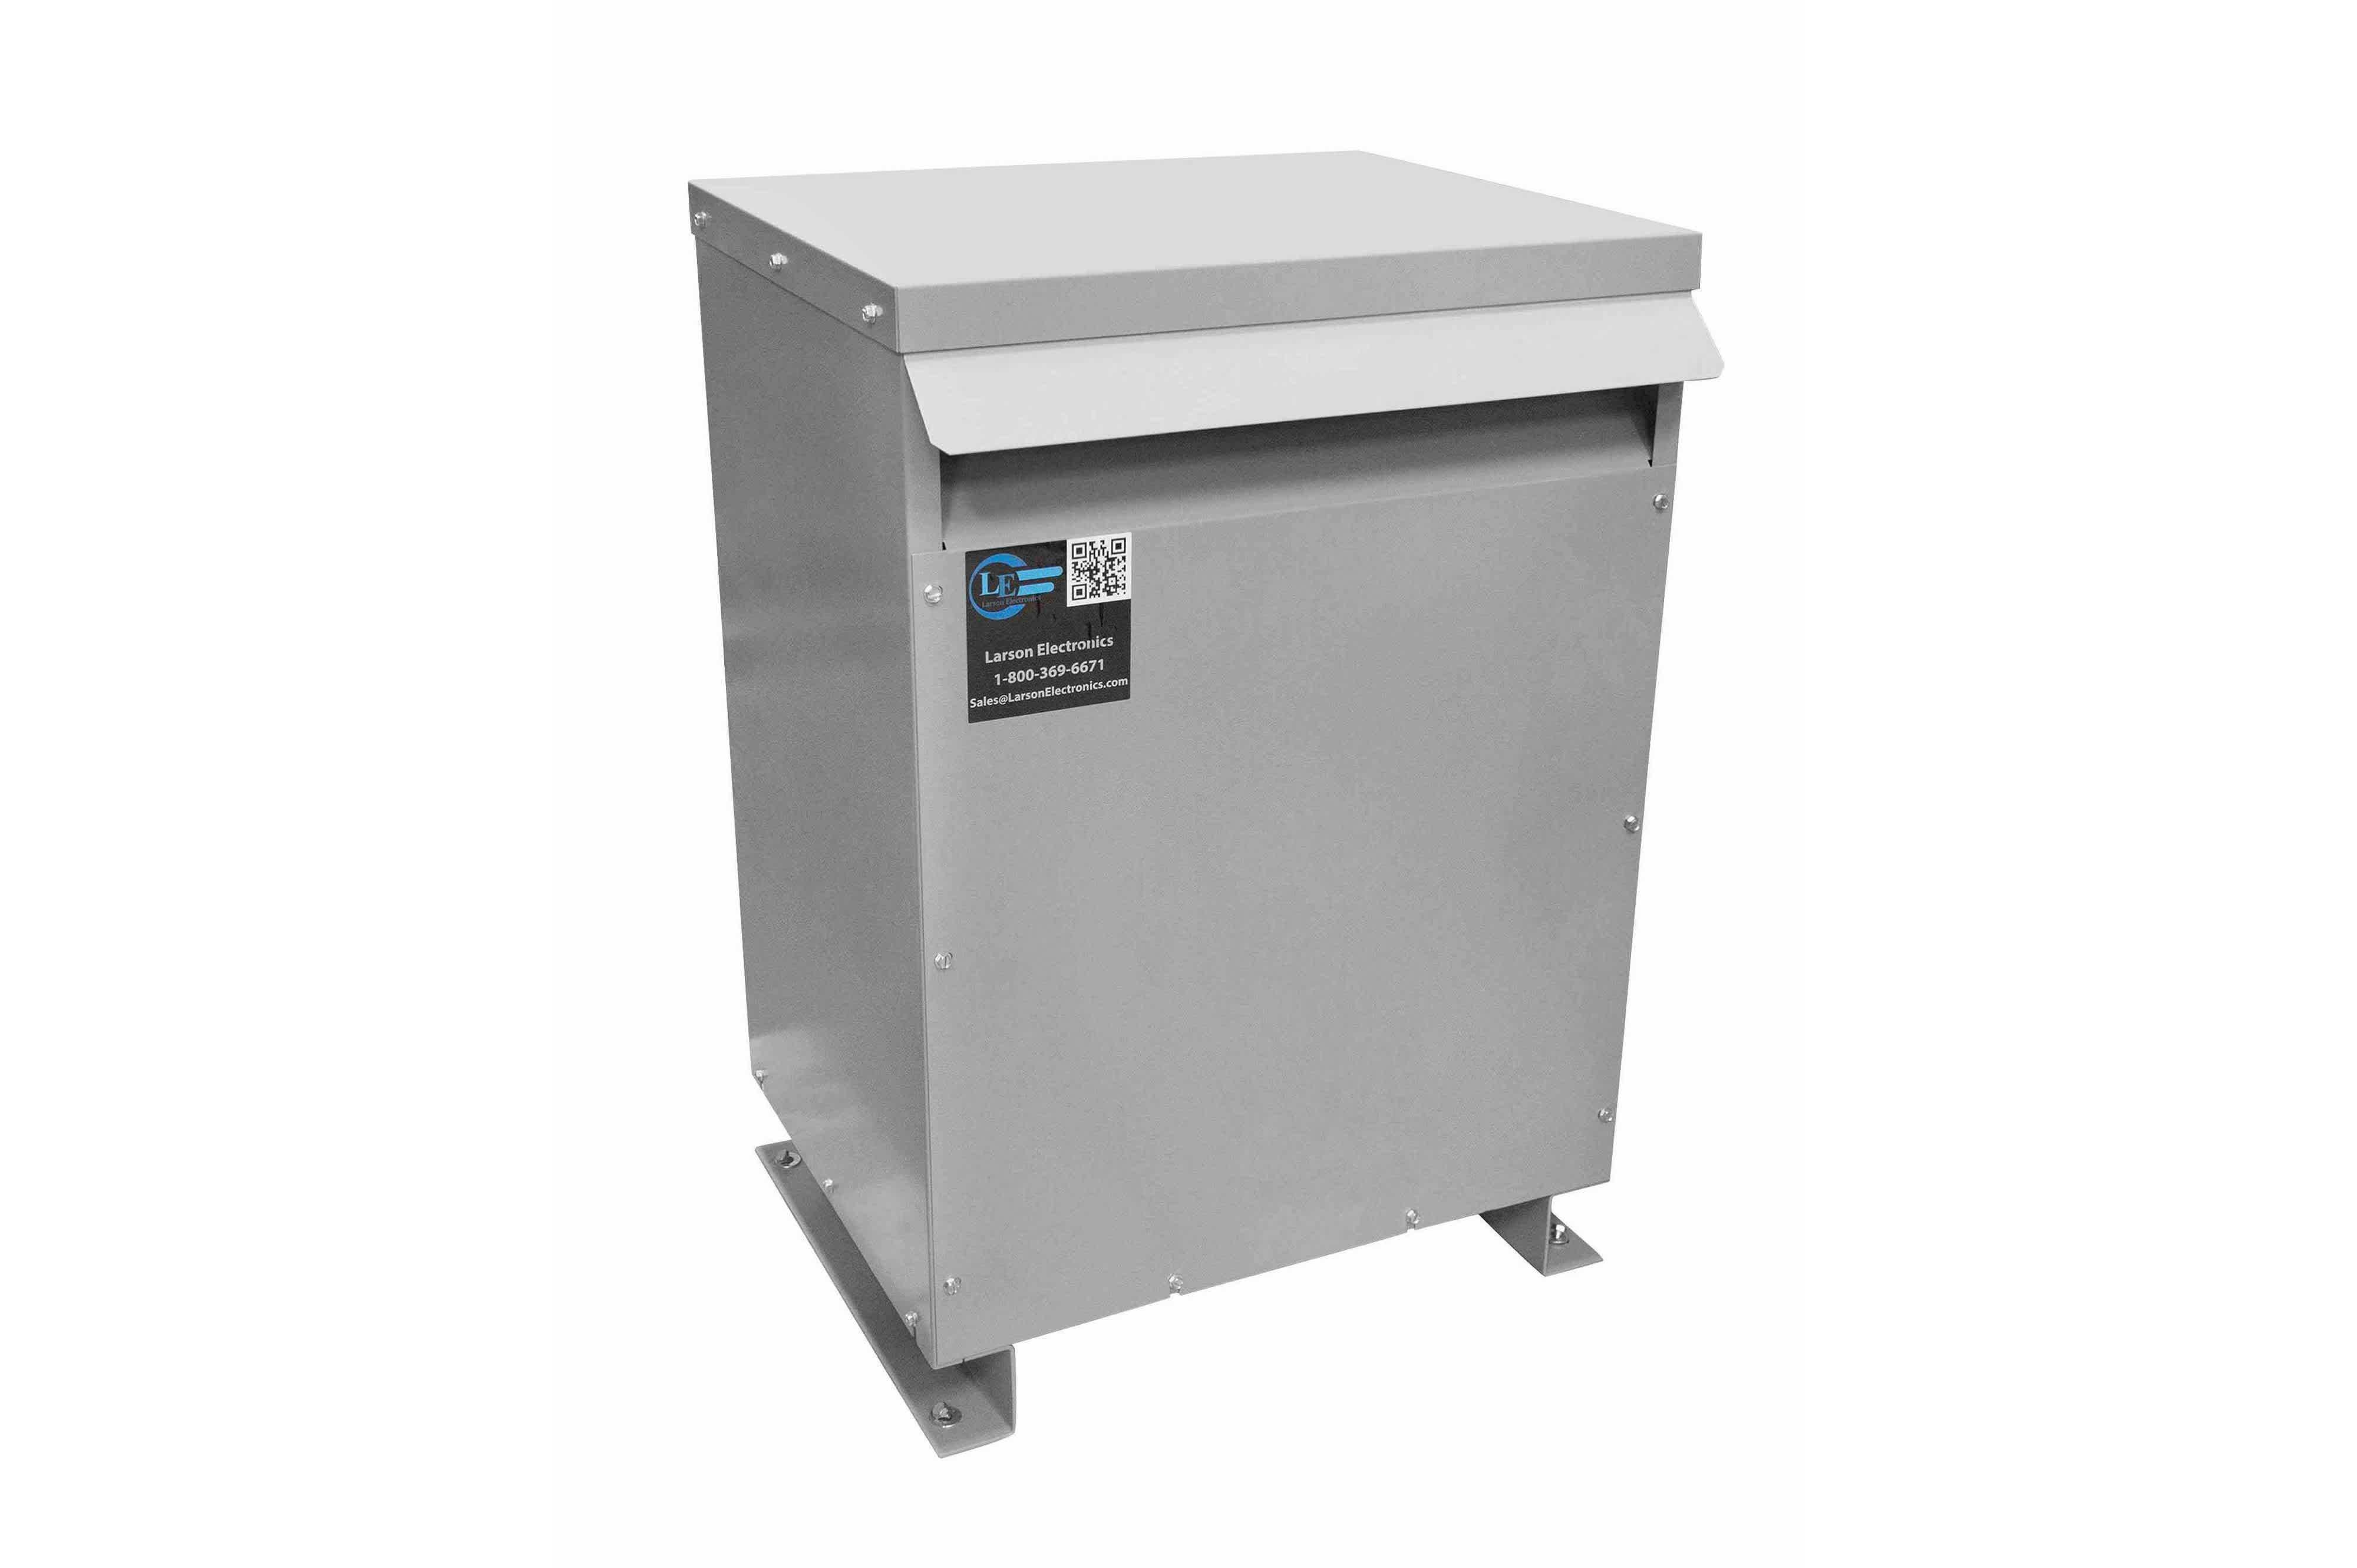 45 kVA 3PH DOE Transformer, 460V Delta Primary, 575Y/332 Wye-N Secondary, N3R, Ventilated, 60 Hz